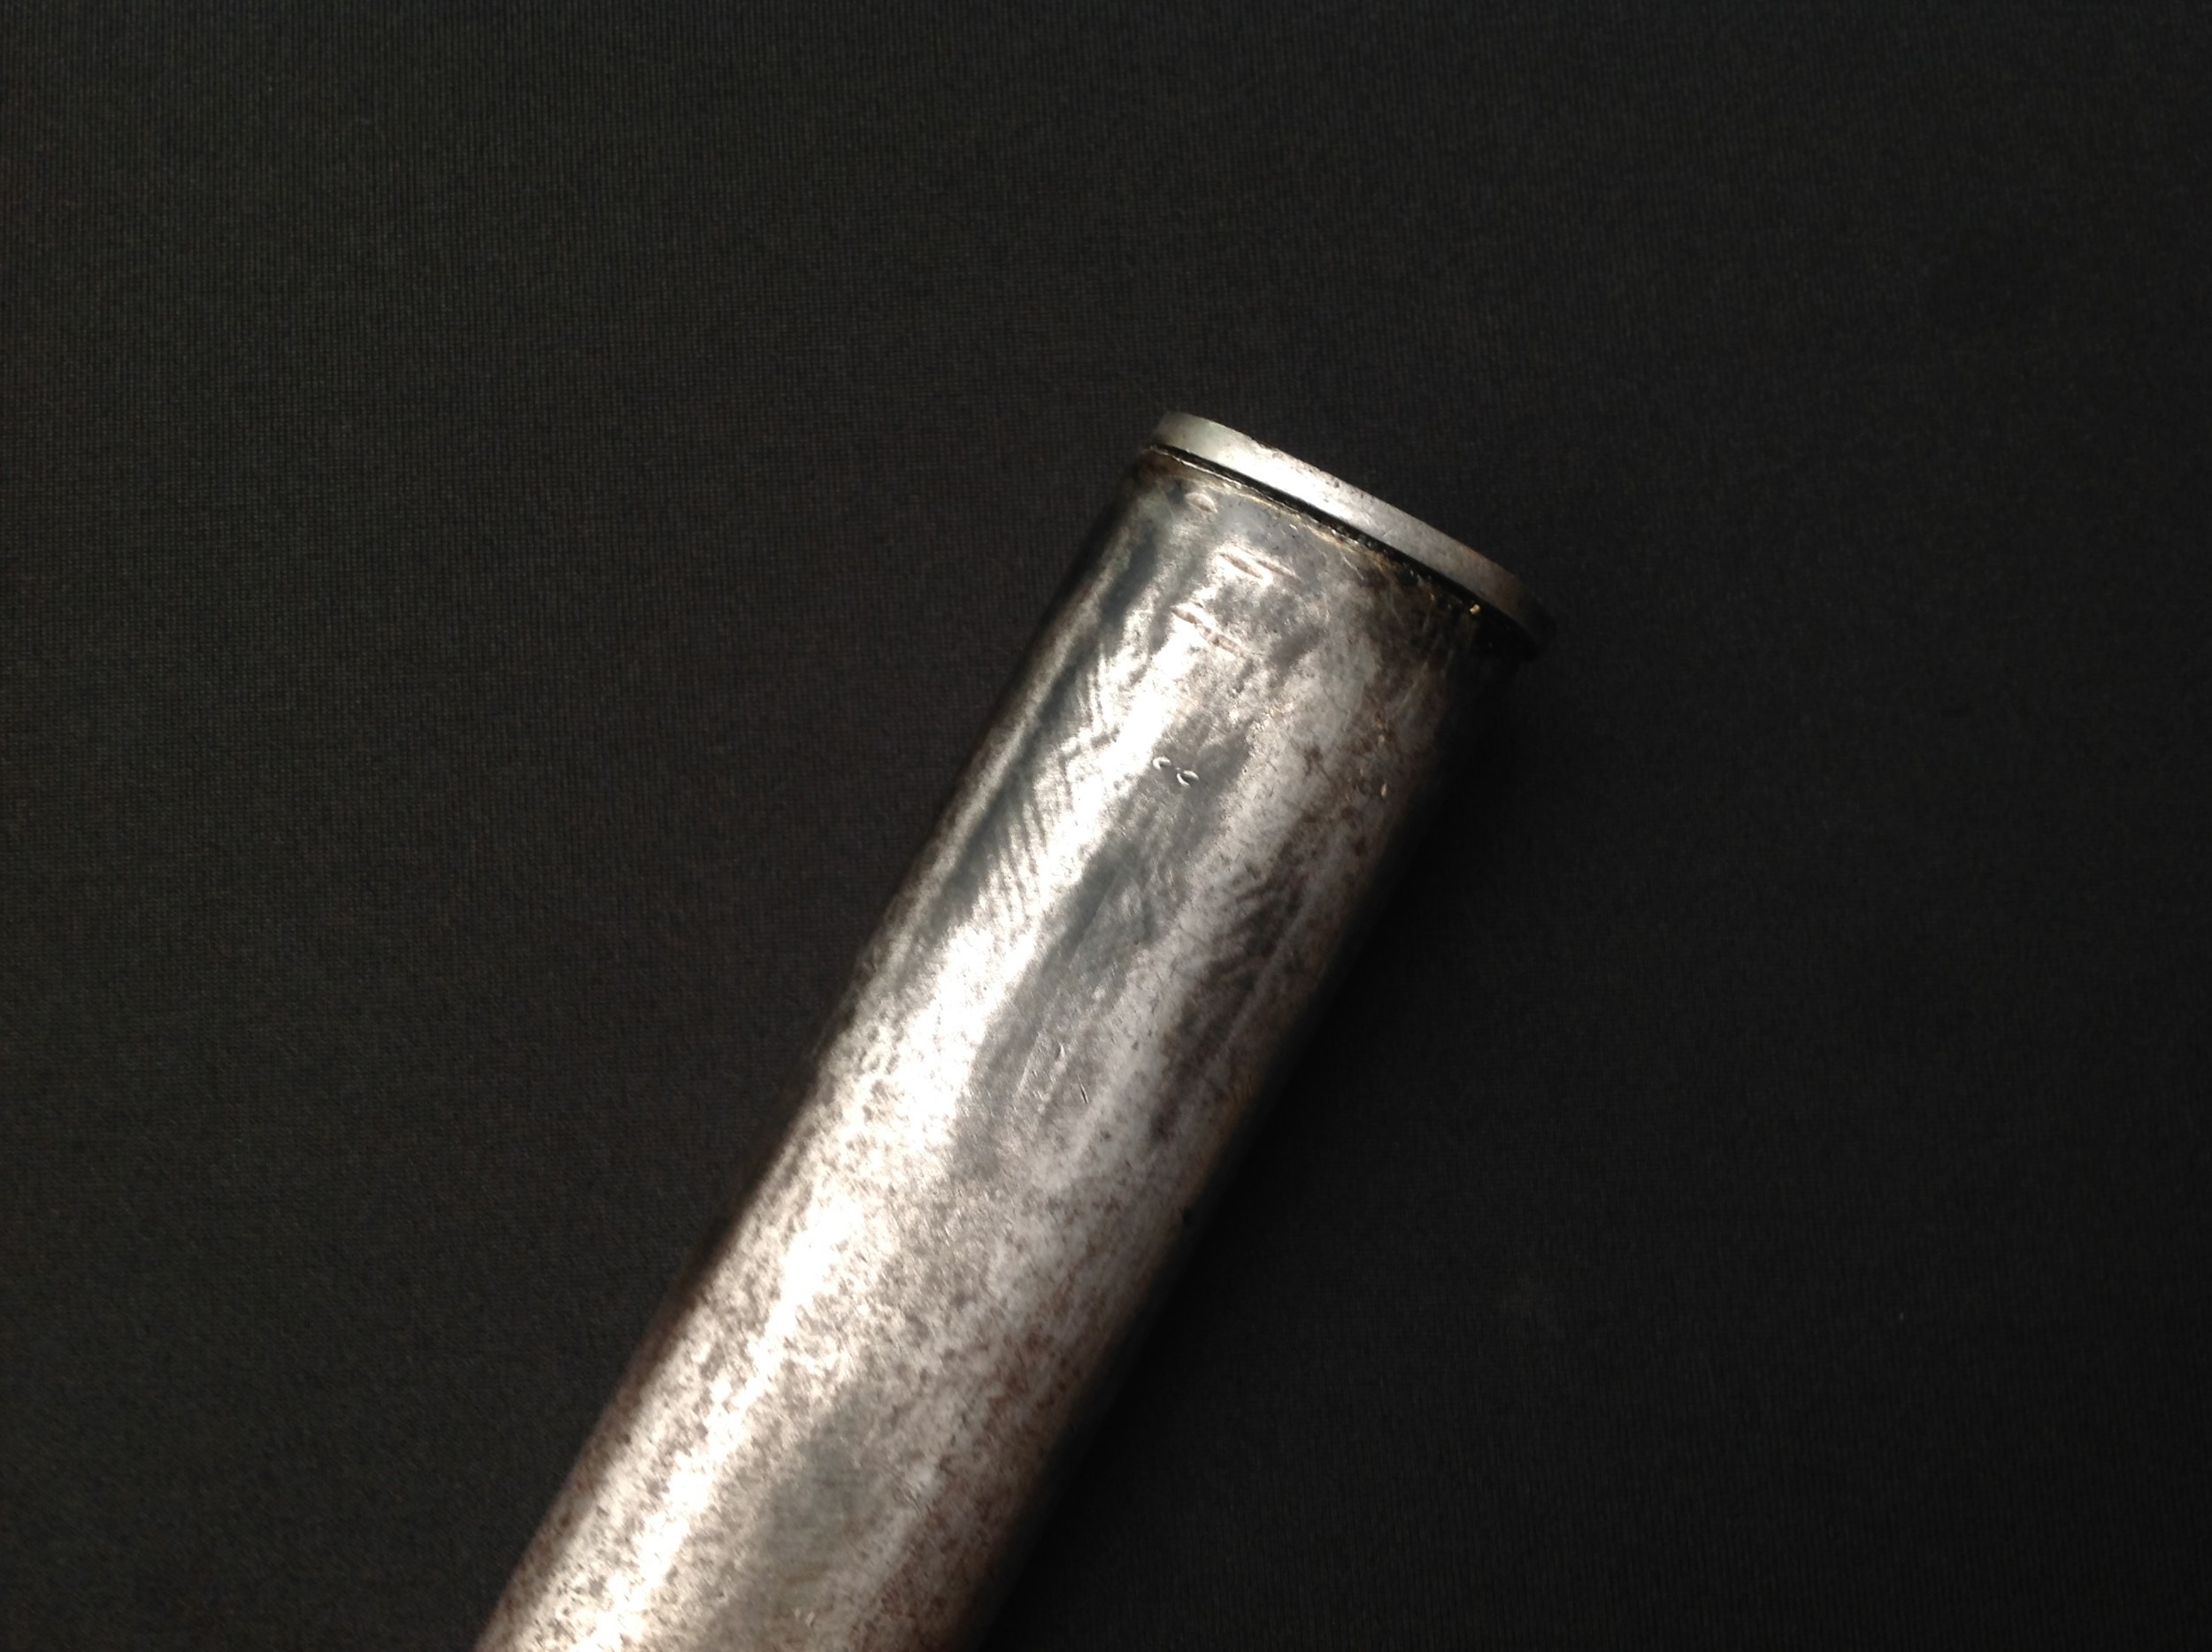 British 1888 pattern Lee-Metford bayonet by Wilkinson, London, 30.5cm blade marked 3 02, two-piece - Image 10 of 18